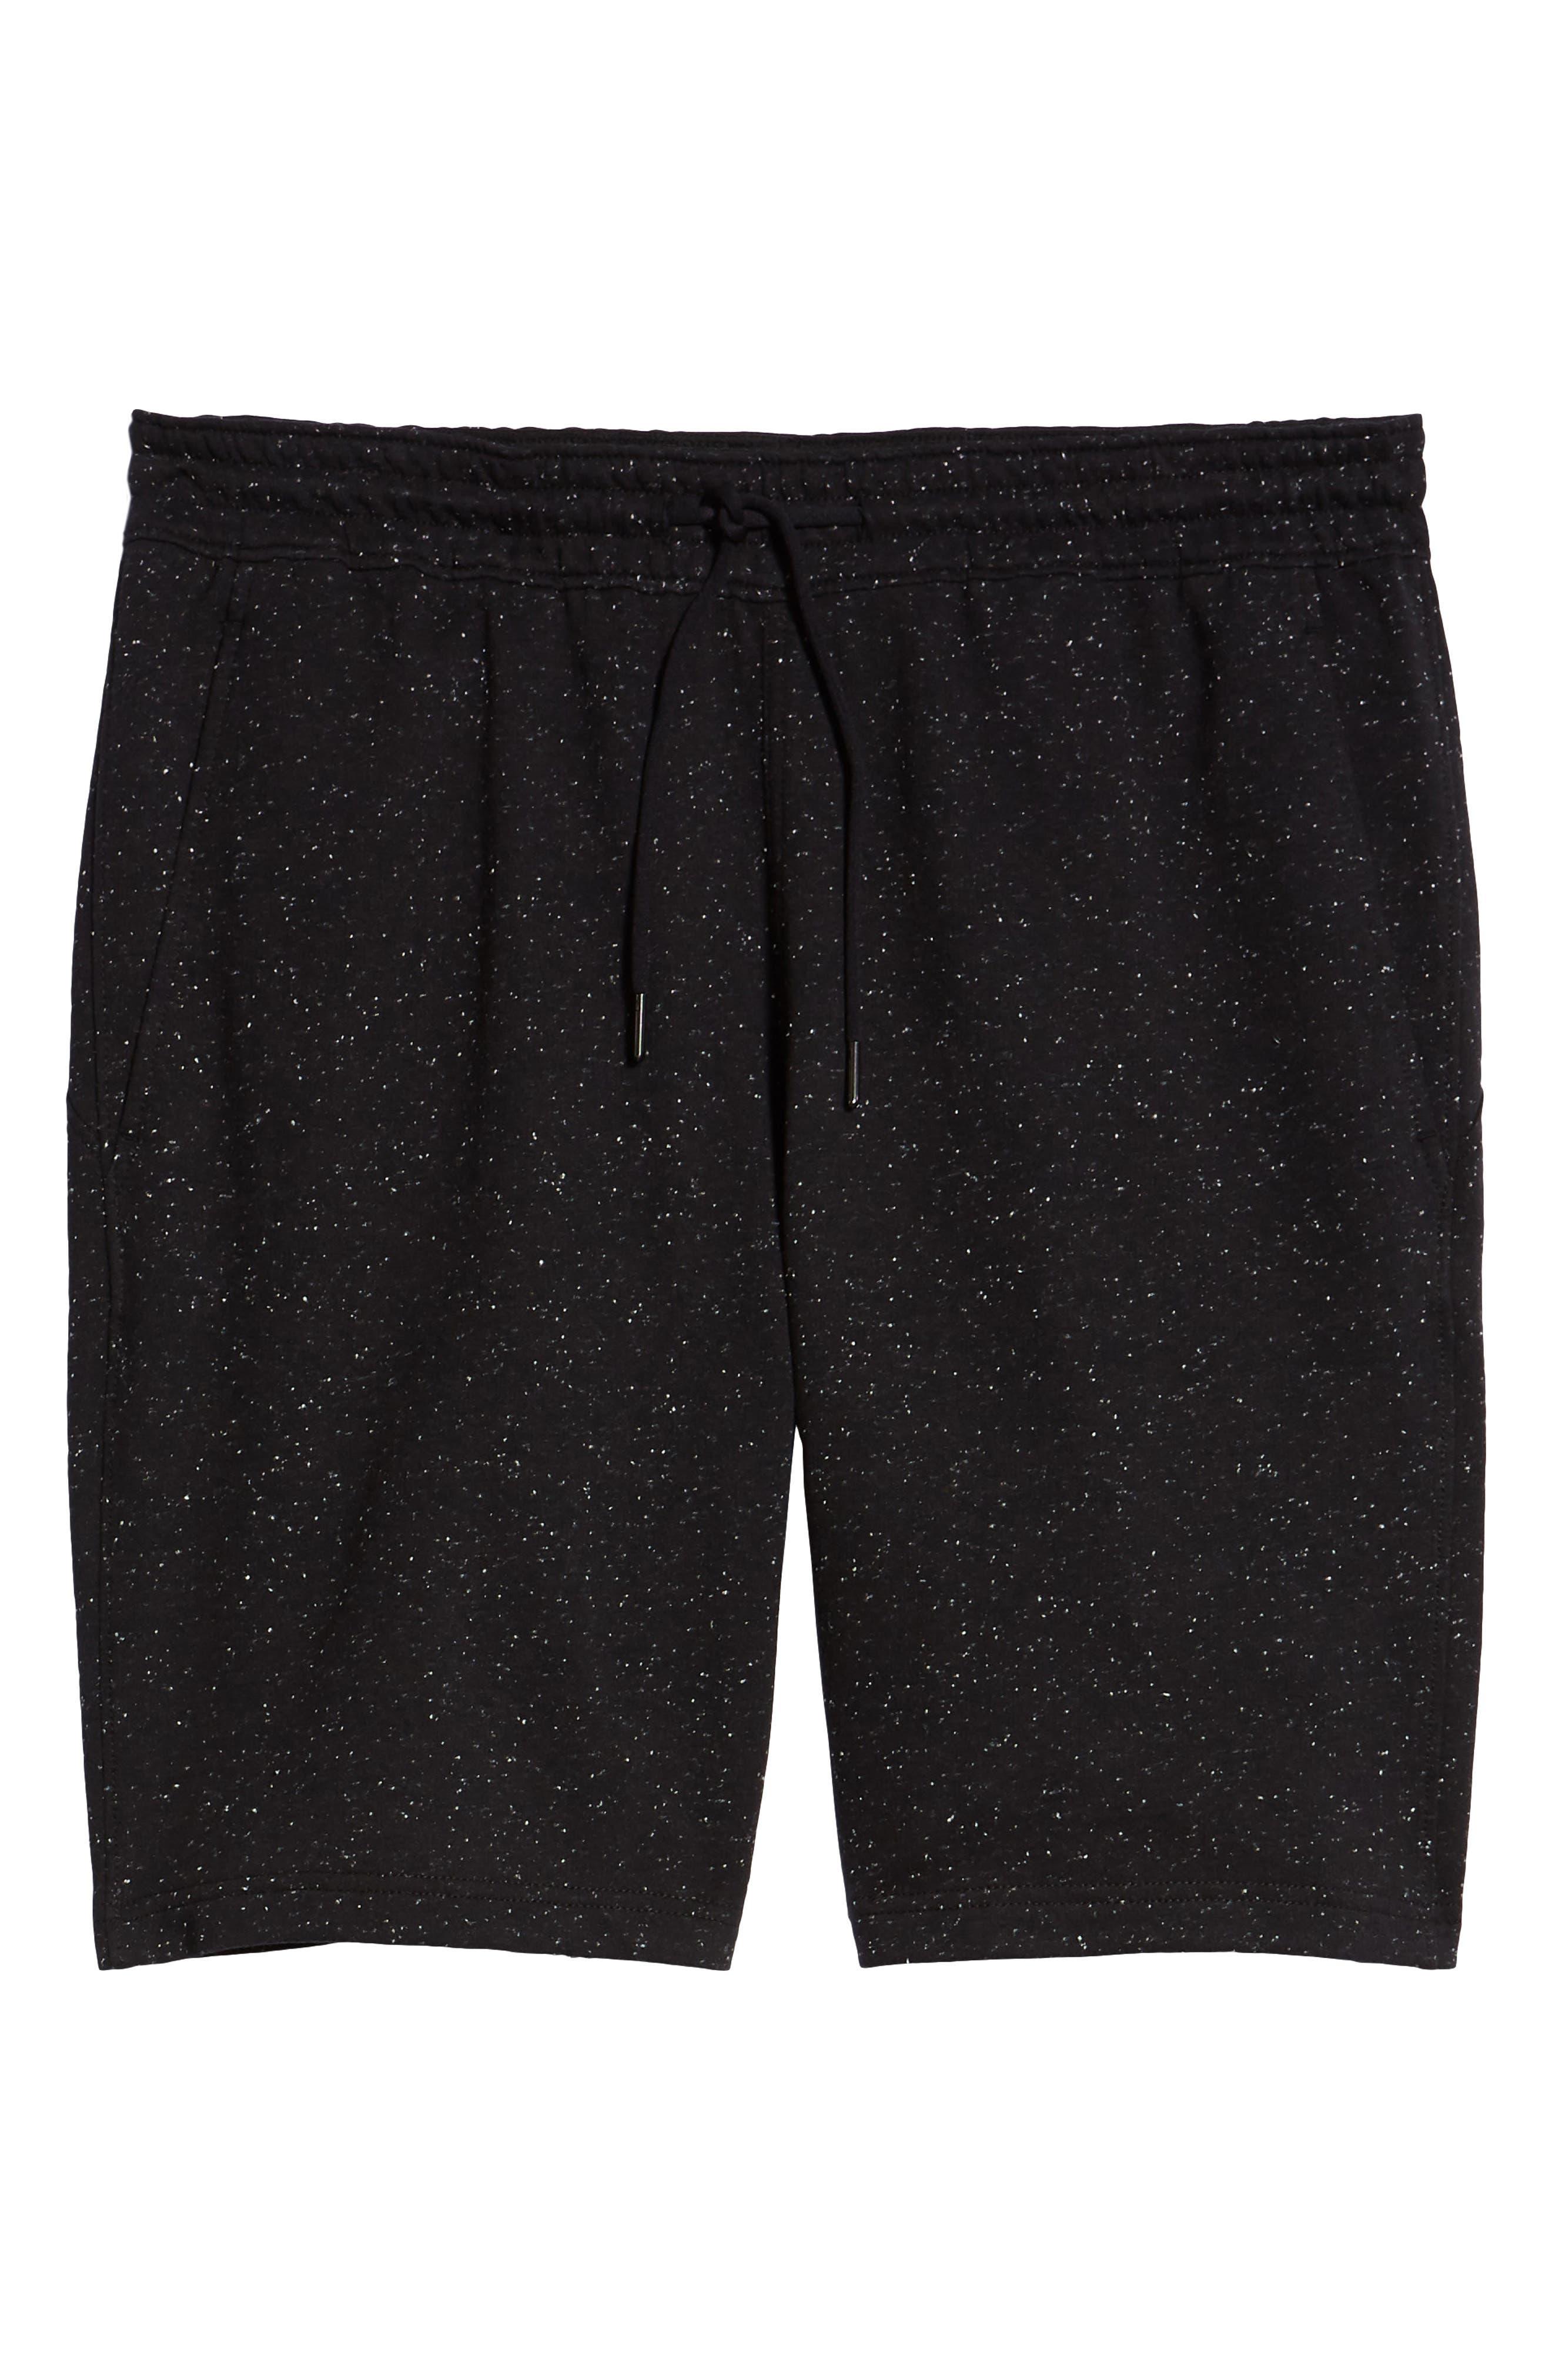 ZELLA, Neppy Fleece Athletic Shorts, Alternate thumbnail 7, color, 001